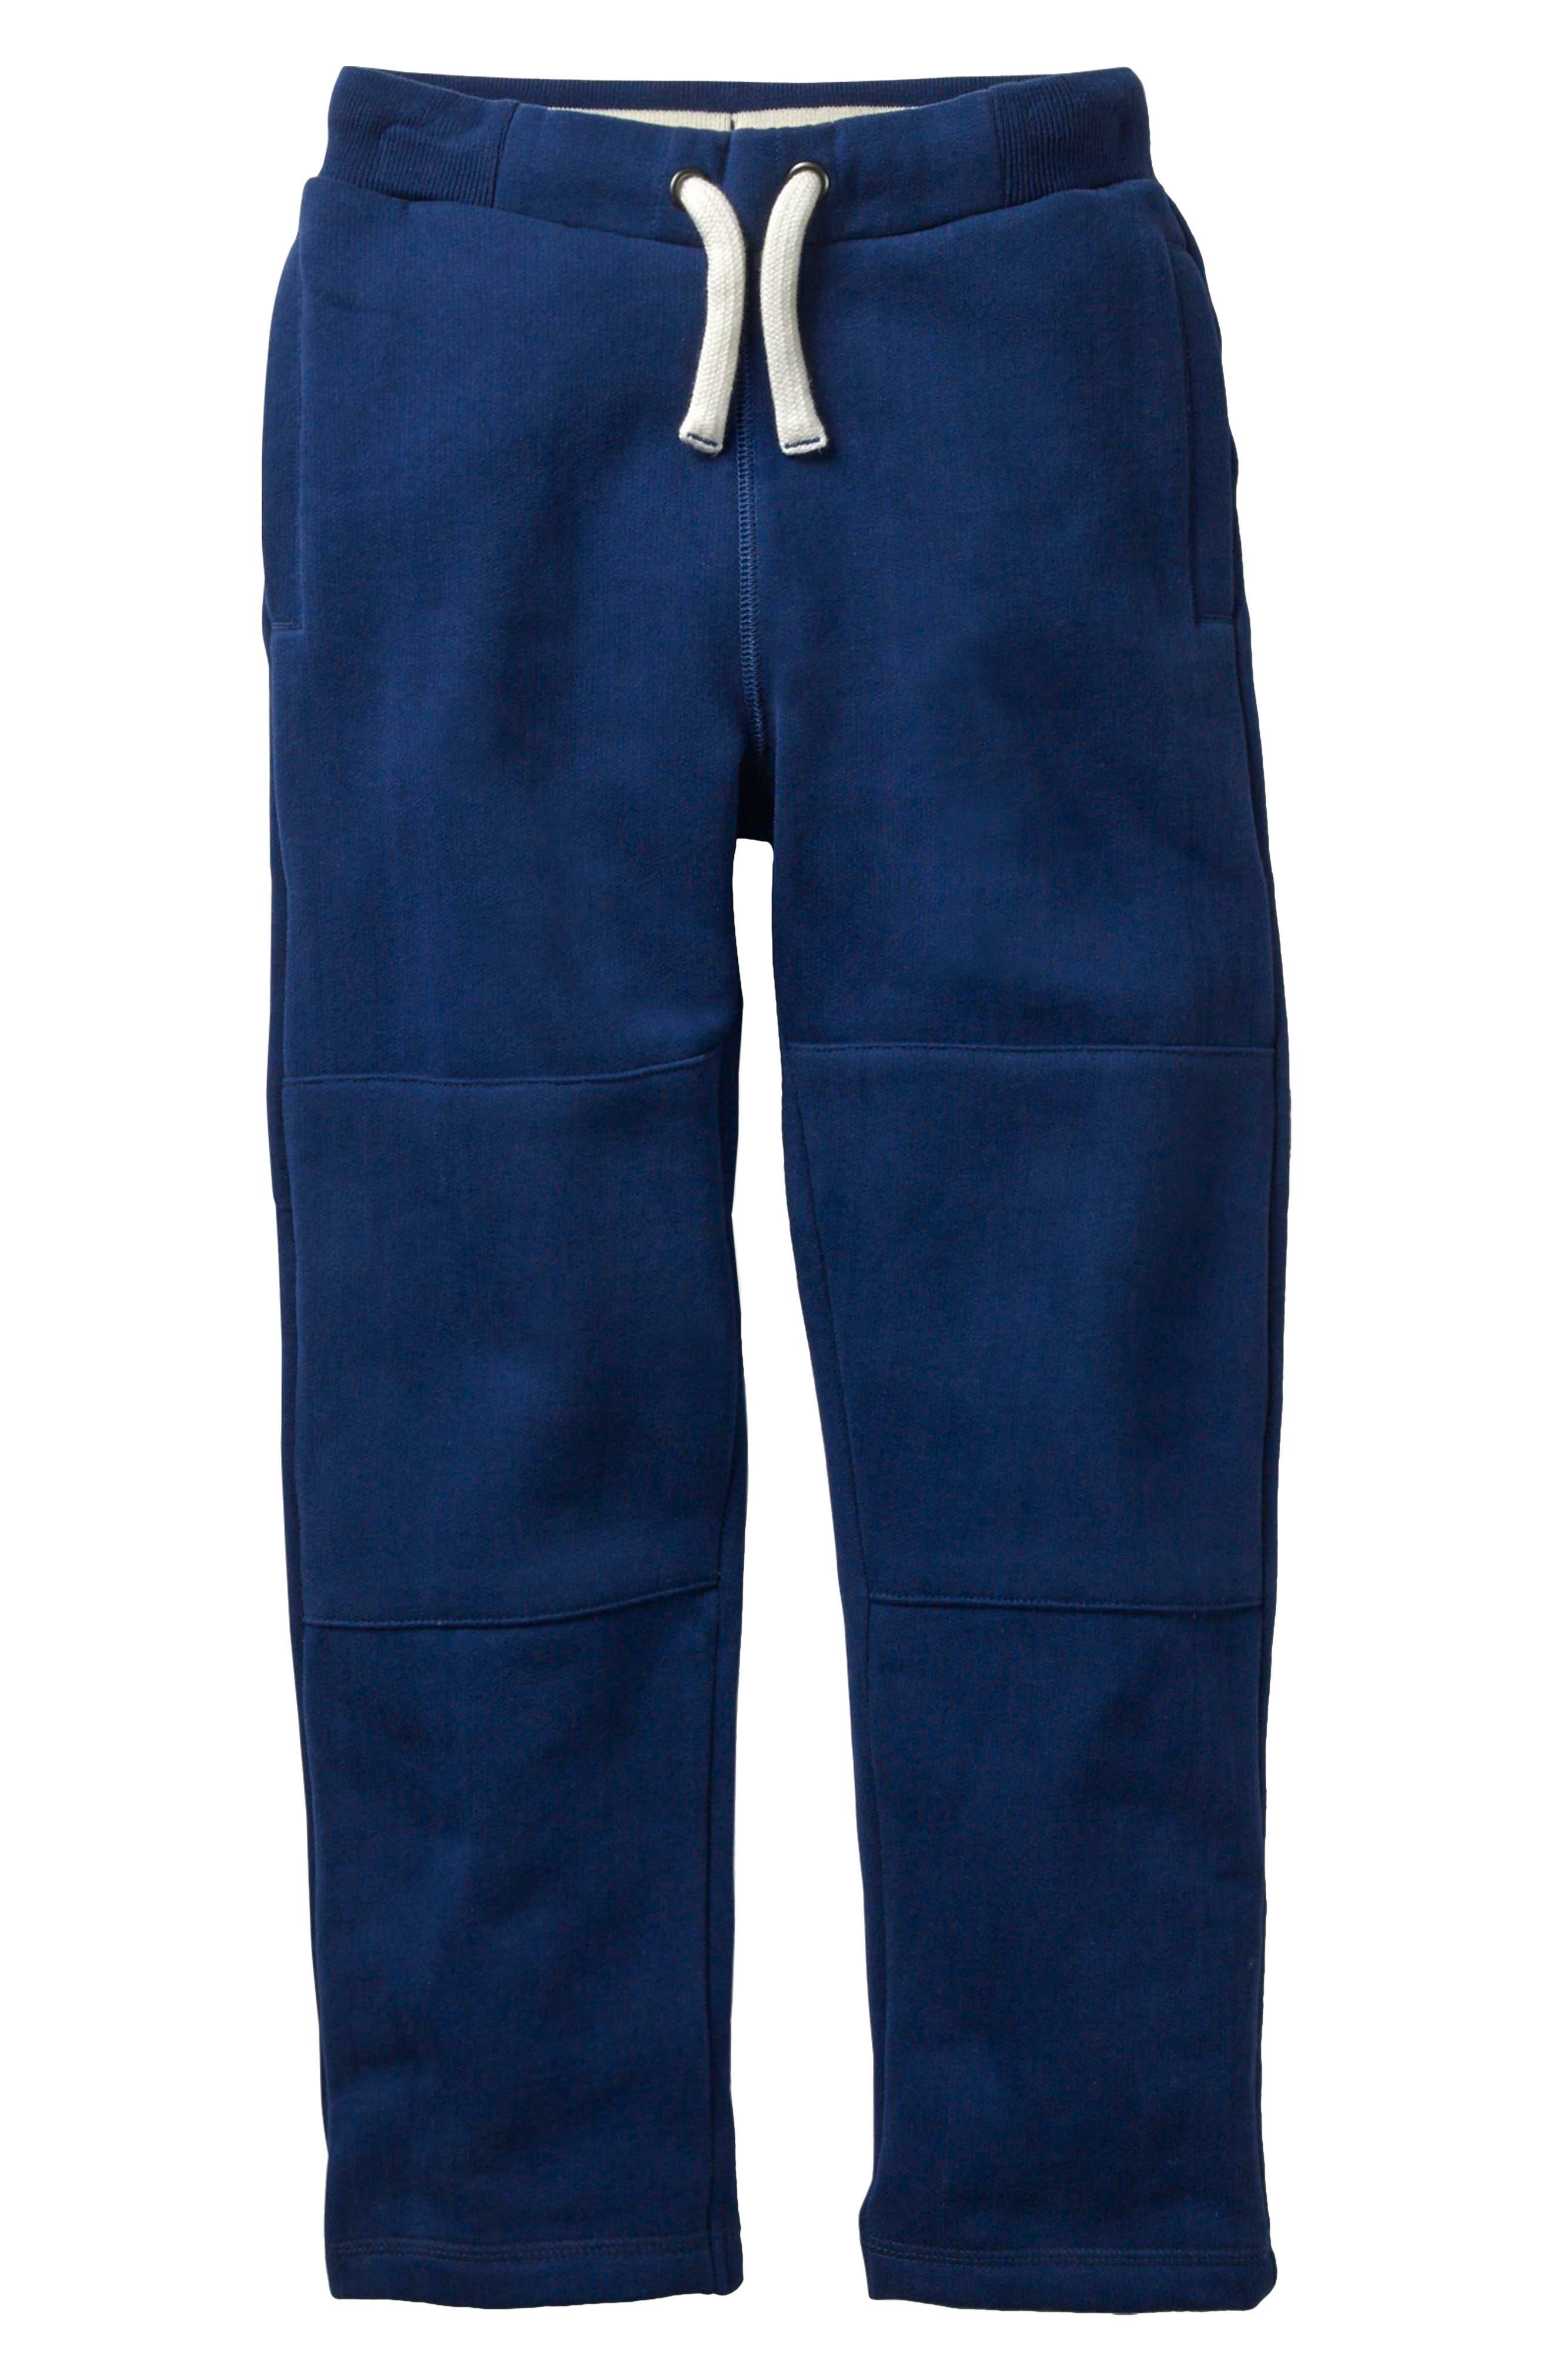 Warrior Knee Sweatpants,                             Main thumbnail 1, color,                             Beacon Blue